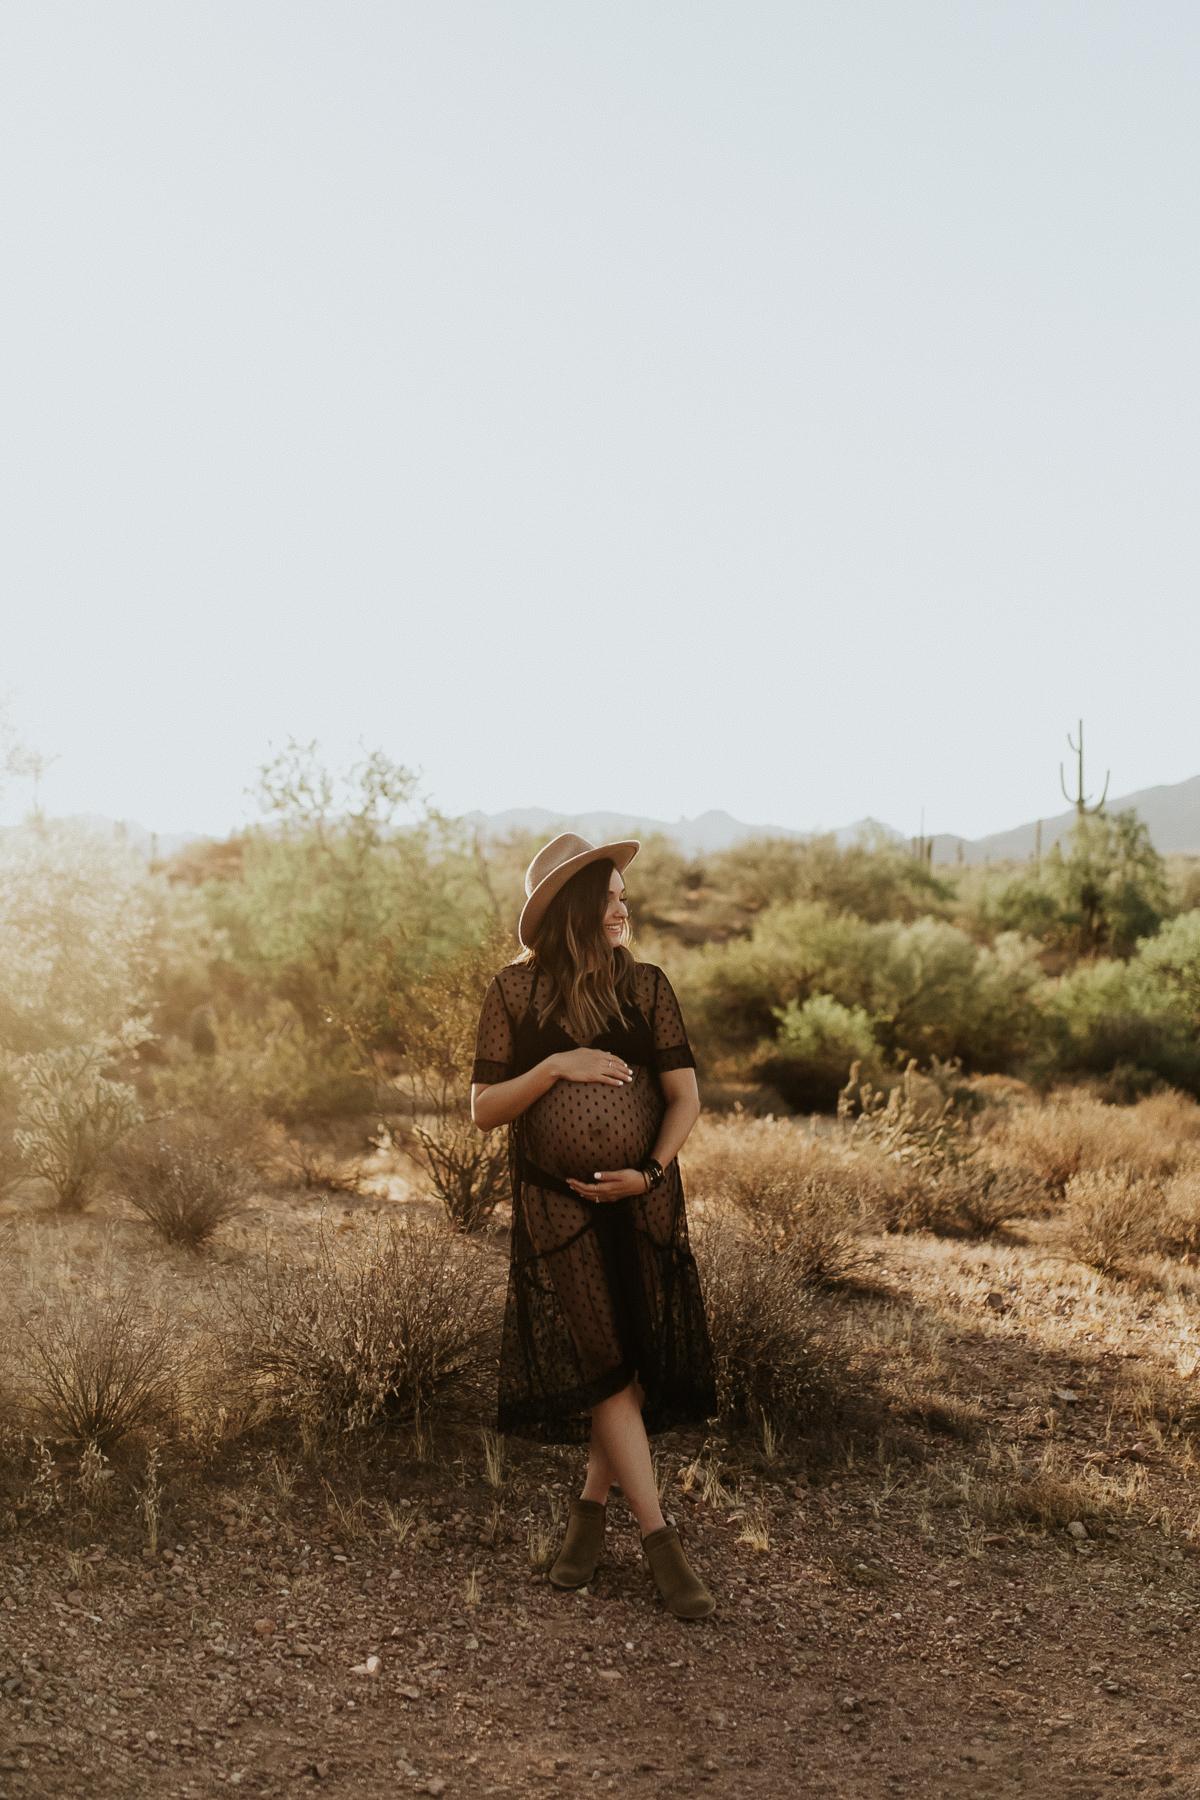 Megan Claire Photography | Phoenix Arizona Maternity and Newborn Photographer. Arizona maternity session in the desert at Phon D Sutton Recreation area in Mesa, Arizona @meganclairephoto